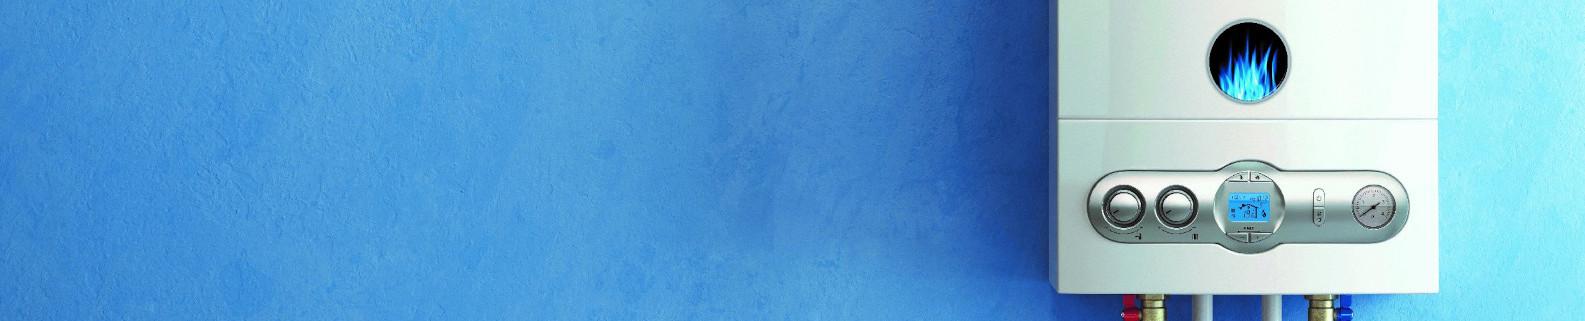 Gasheizung an blauer Wand